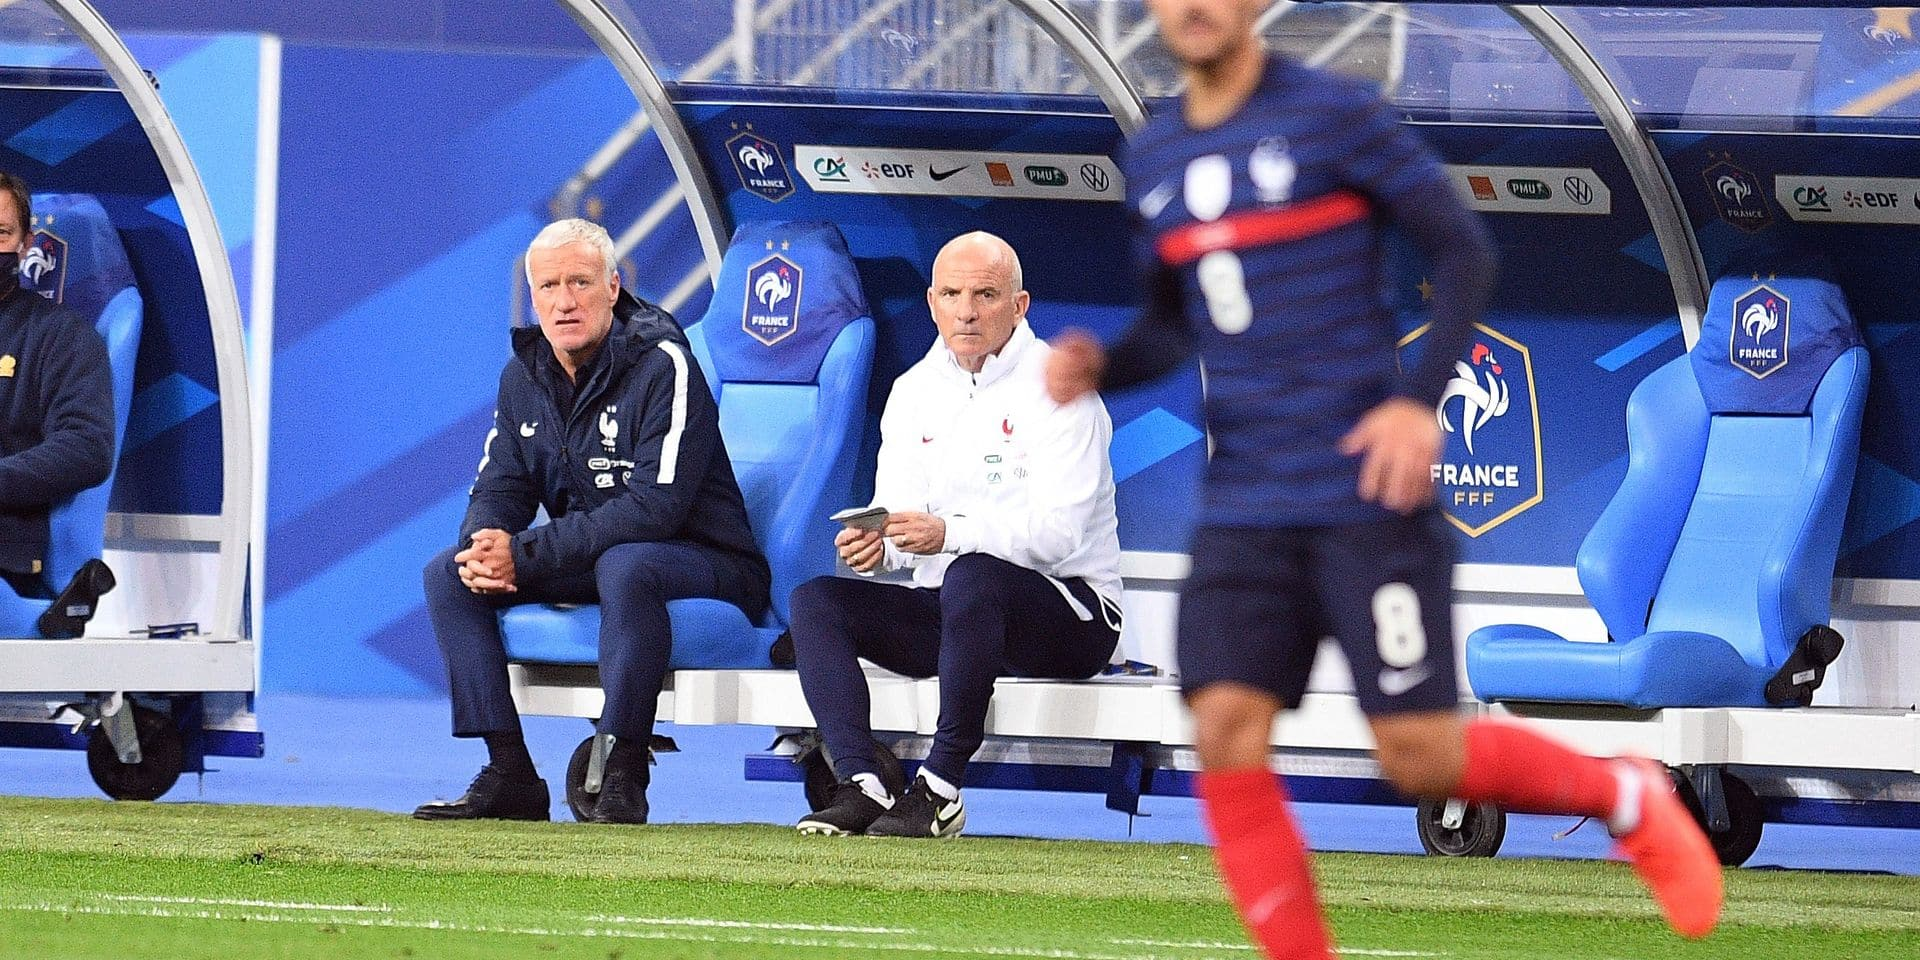 France vs Ukraine - International friendly match - Saint-Denis